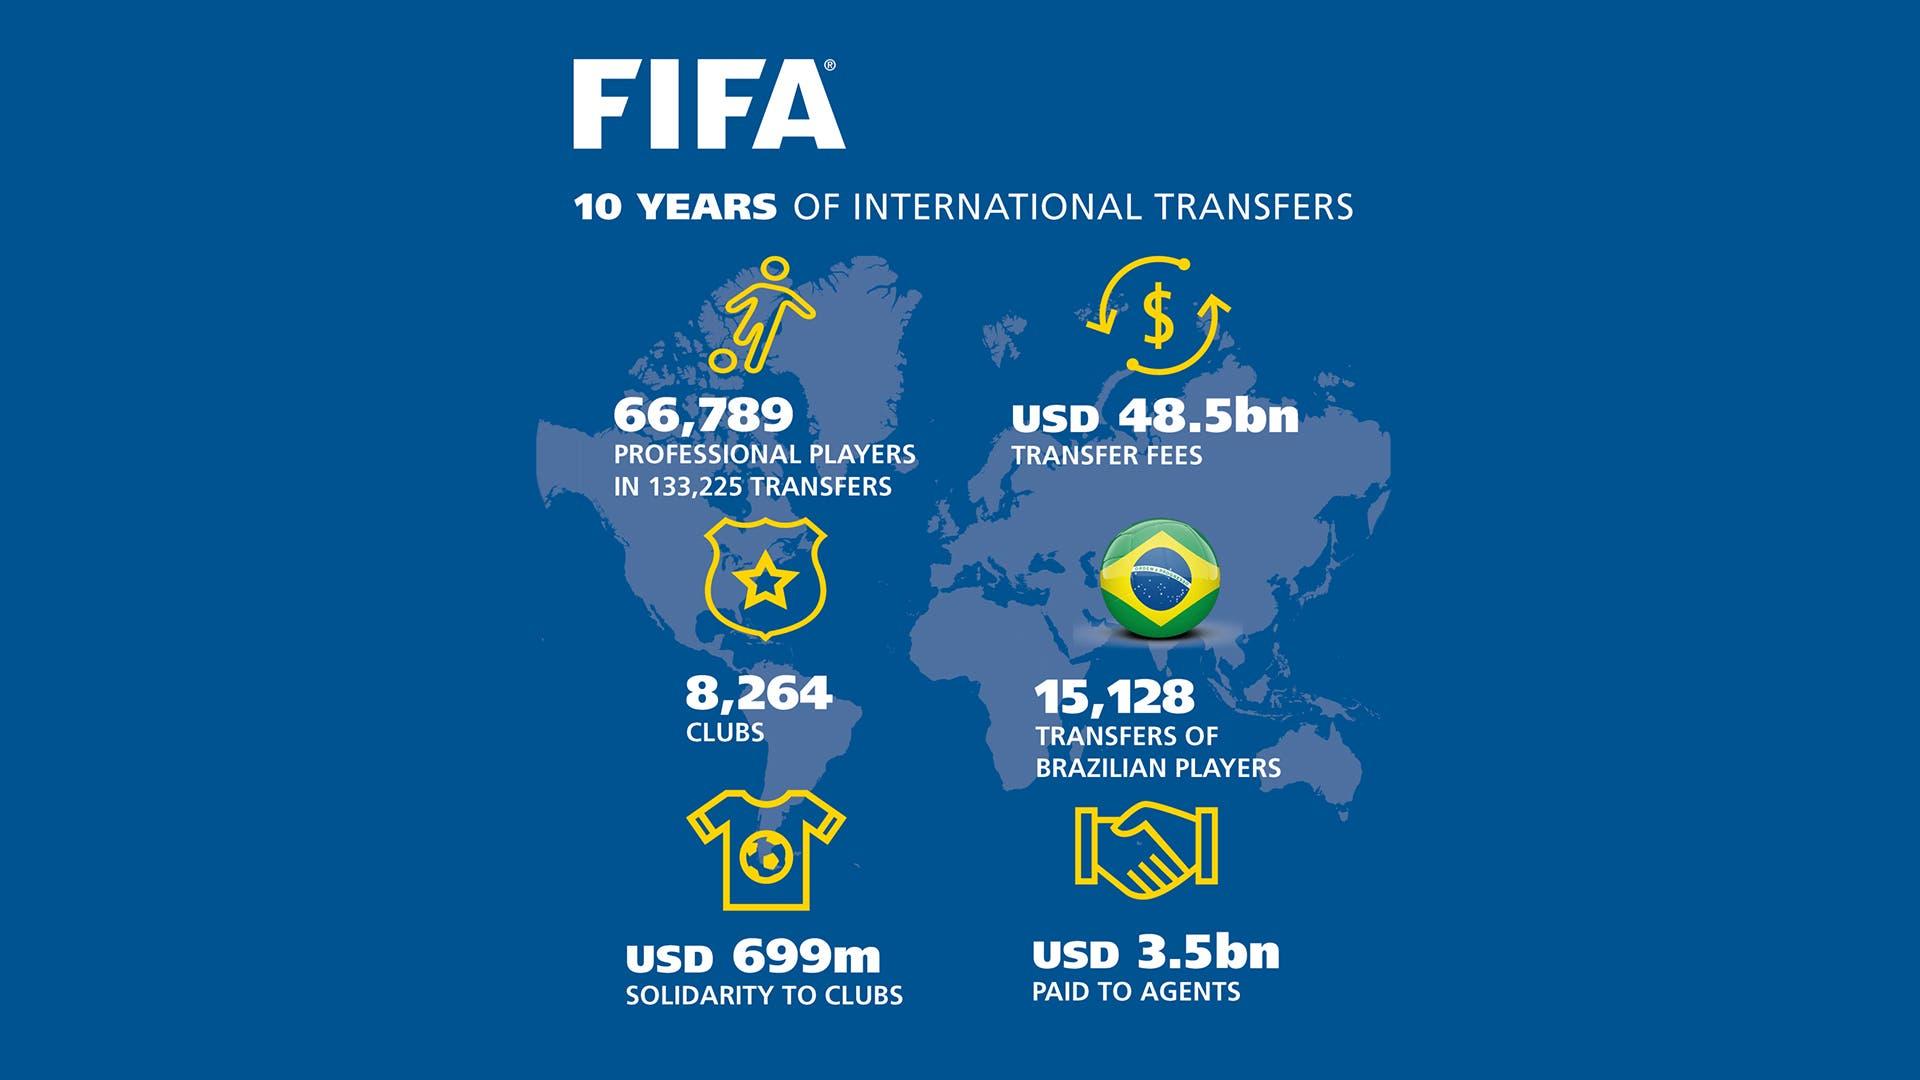 Ten years international transfers infographic (Image: FIFA)